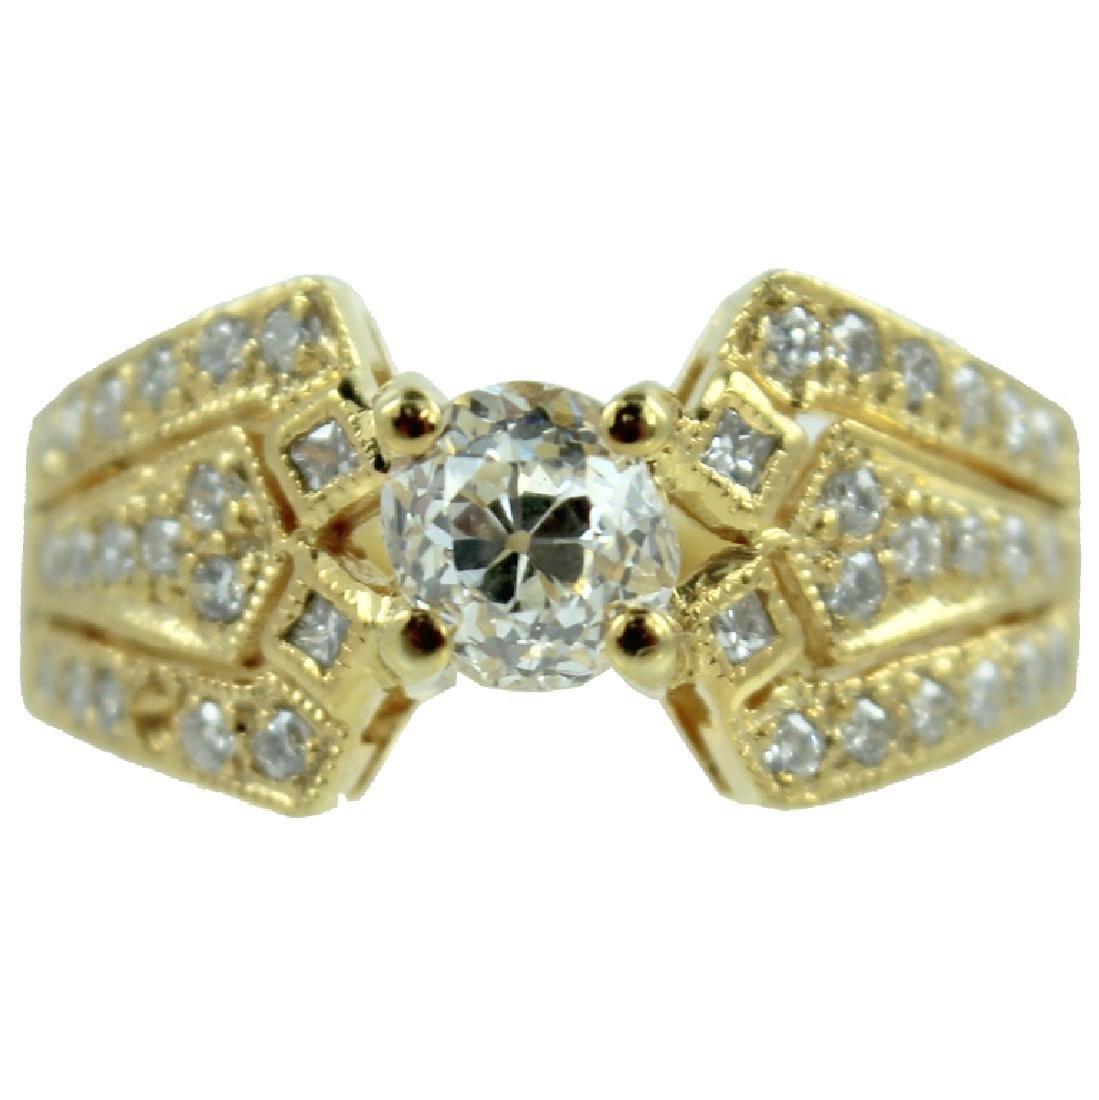 OLD MINE CUT DIAMOND. 0.60 POINTS. 18K